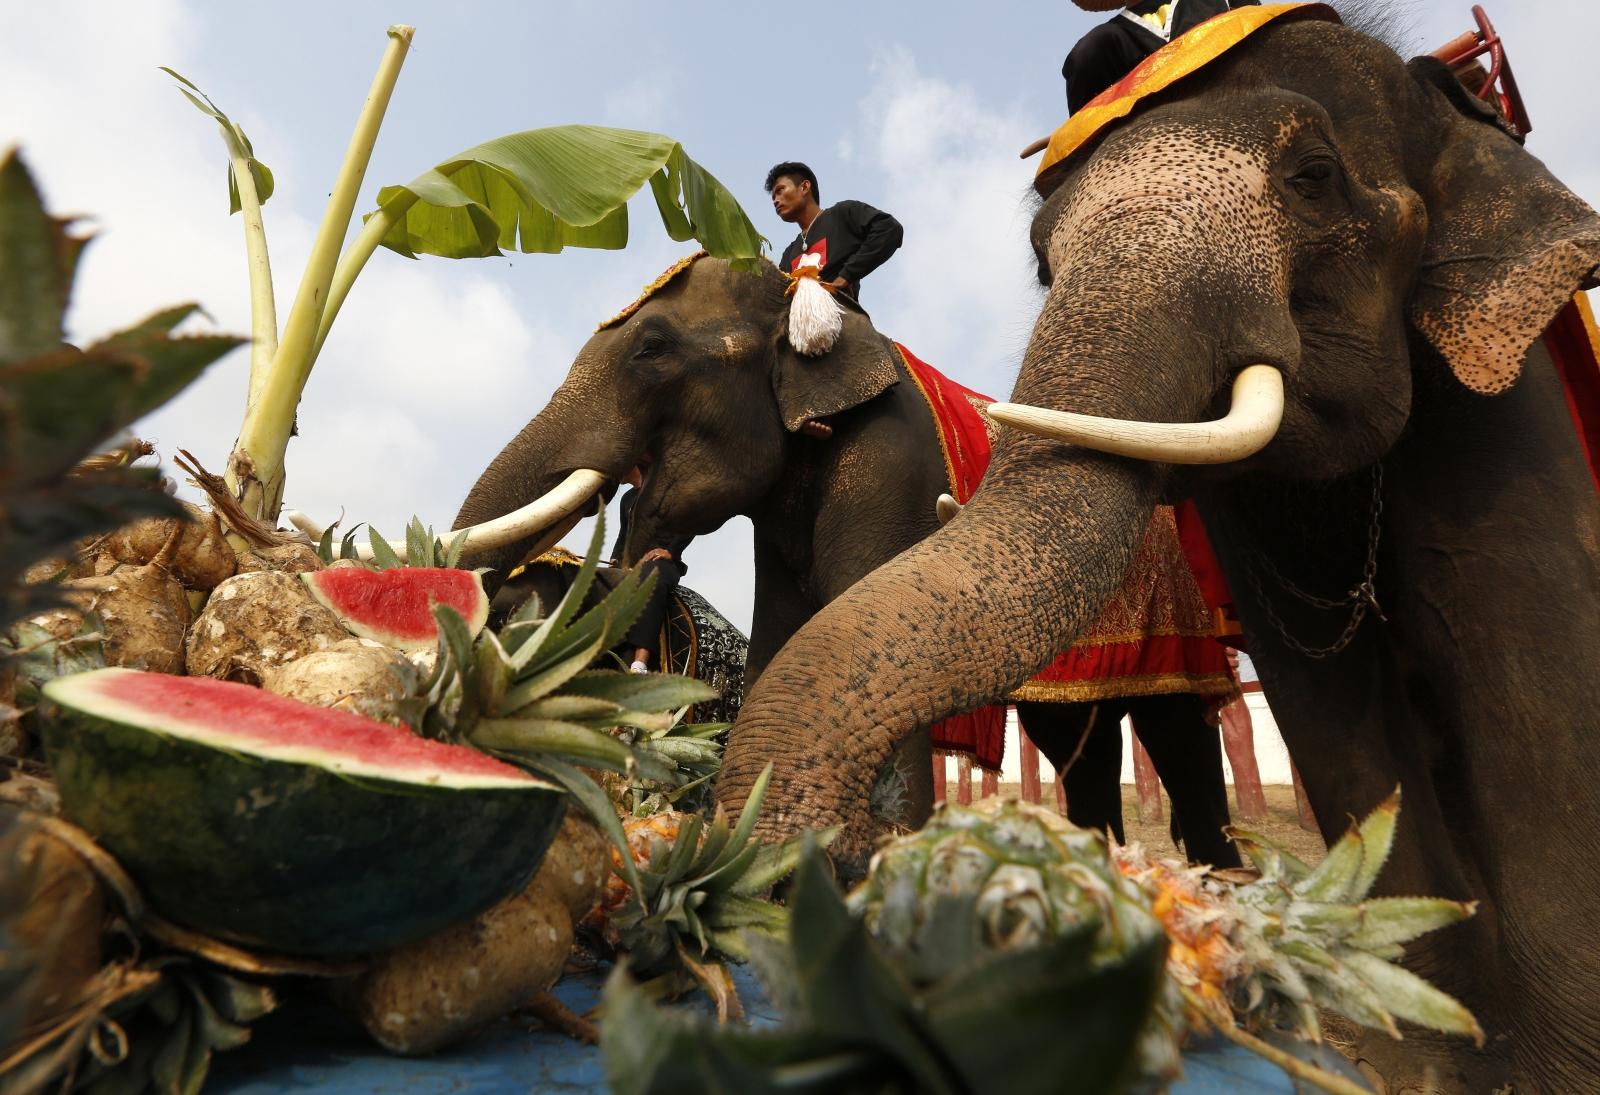 Dzień Słonia w Tajlandii. Fot. PAP/EPA/NARONG SANGANK